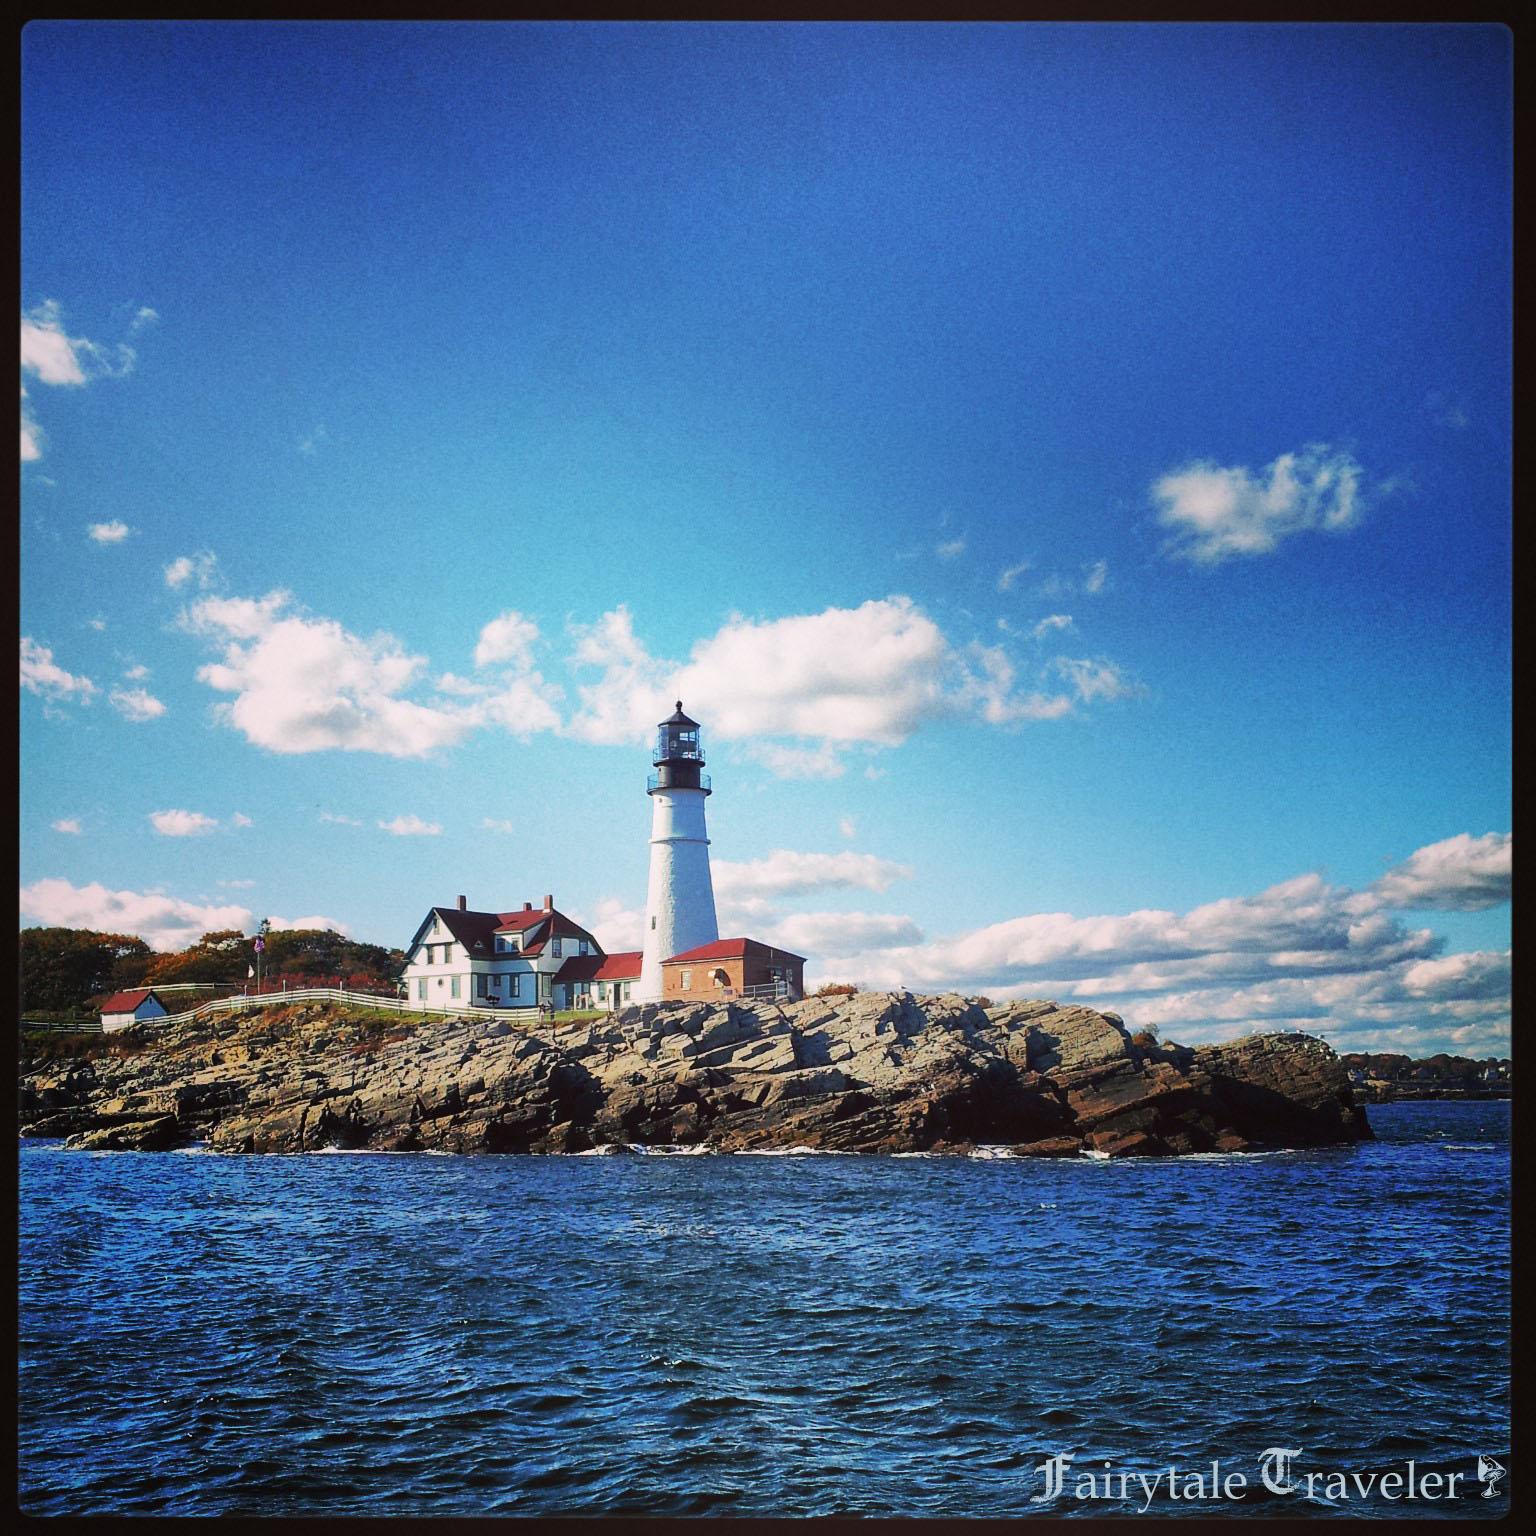 Thompson Travel Uk: Portland Discovery Land And Sea Tours, Maine